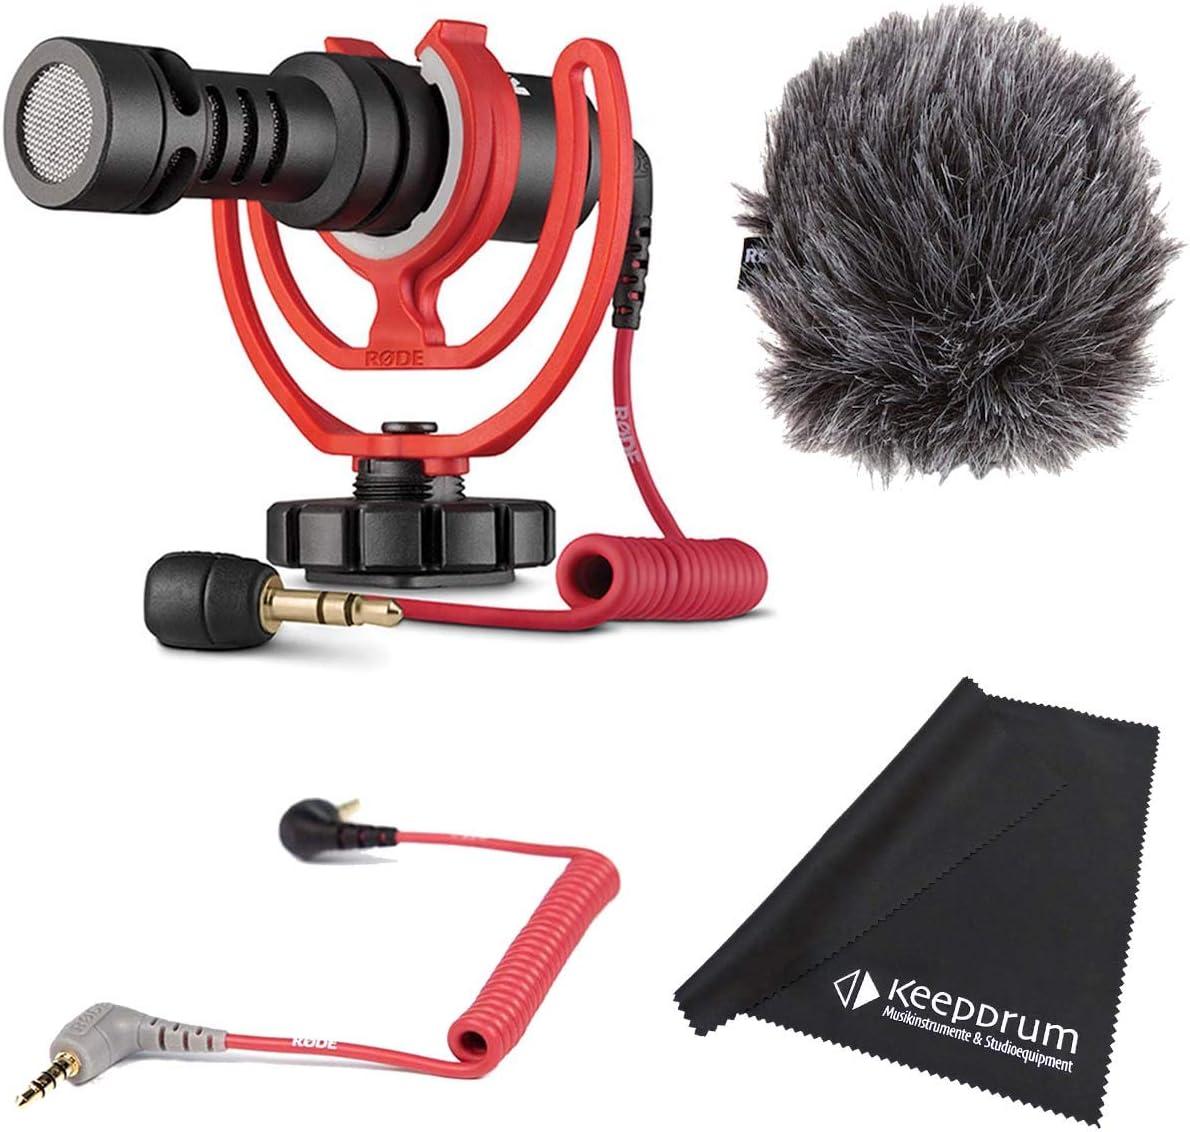 Rode Videomicro - Juego de micrófono de cámara de condensador + cable de conexión SC7 TRS de 3,5 mm – TRRS + paño de microfibra keepdrum